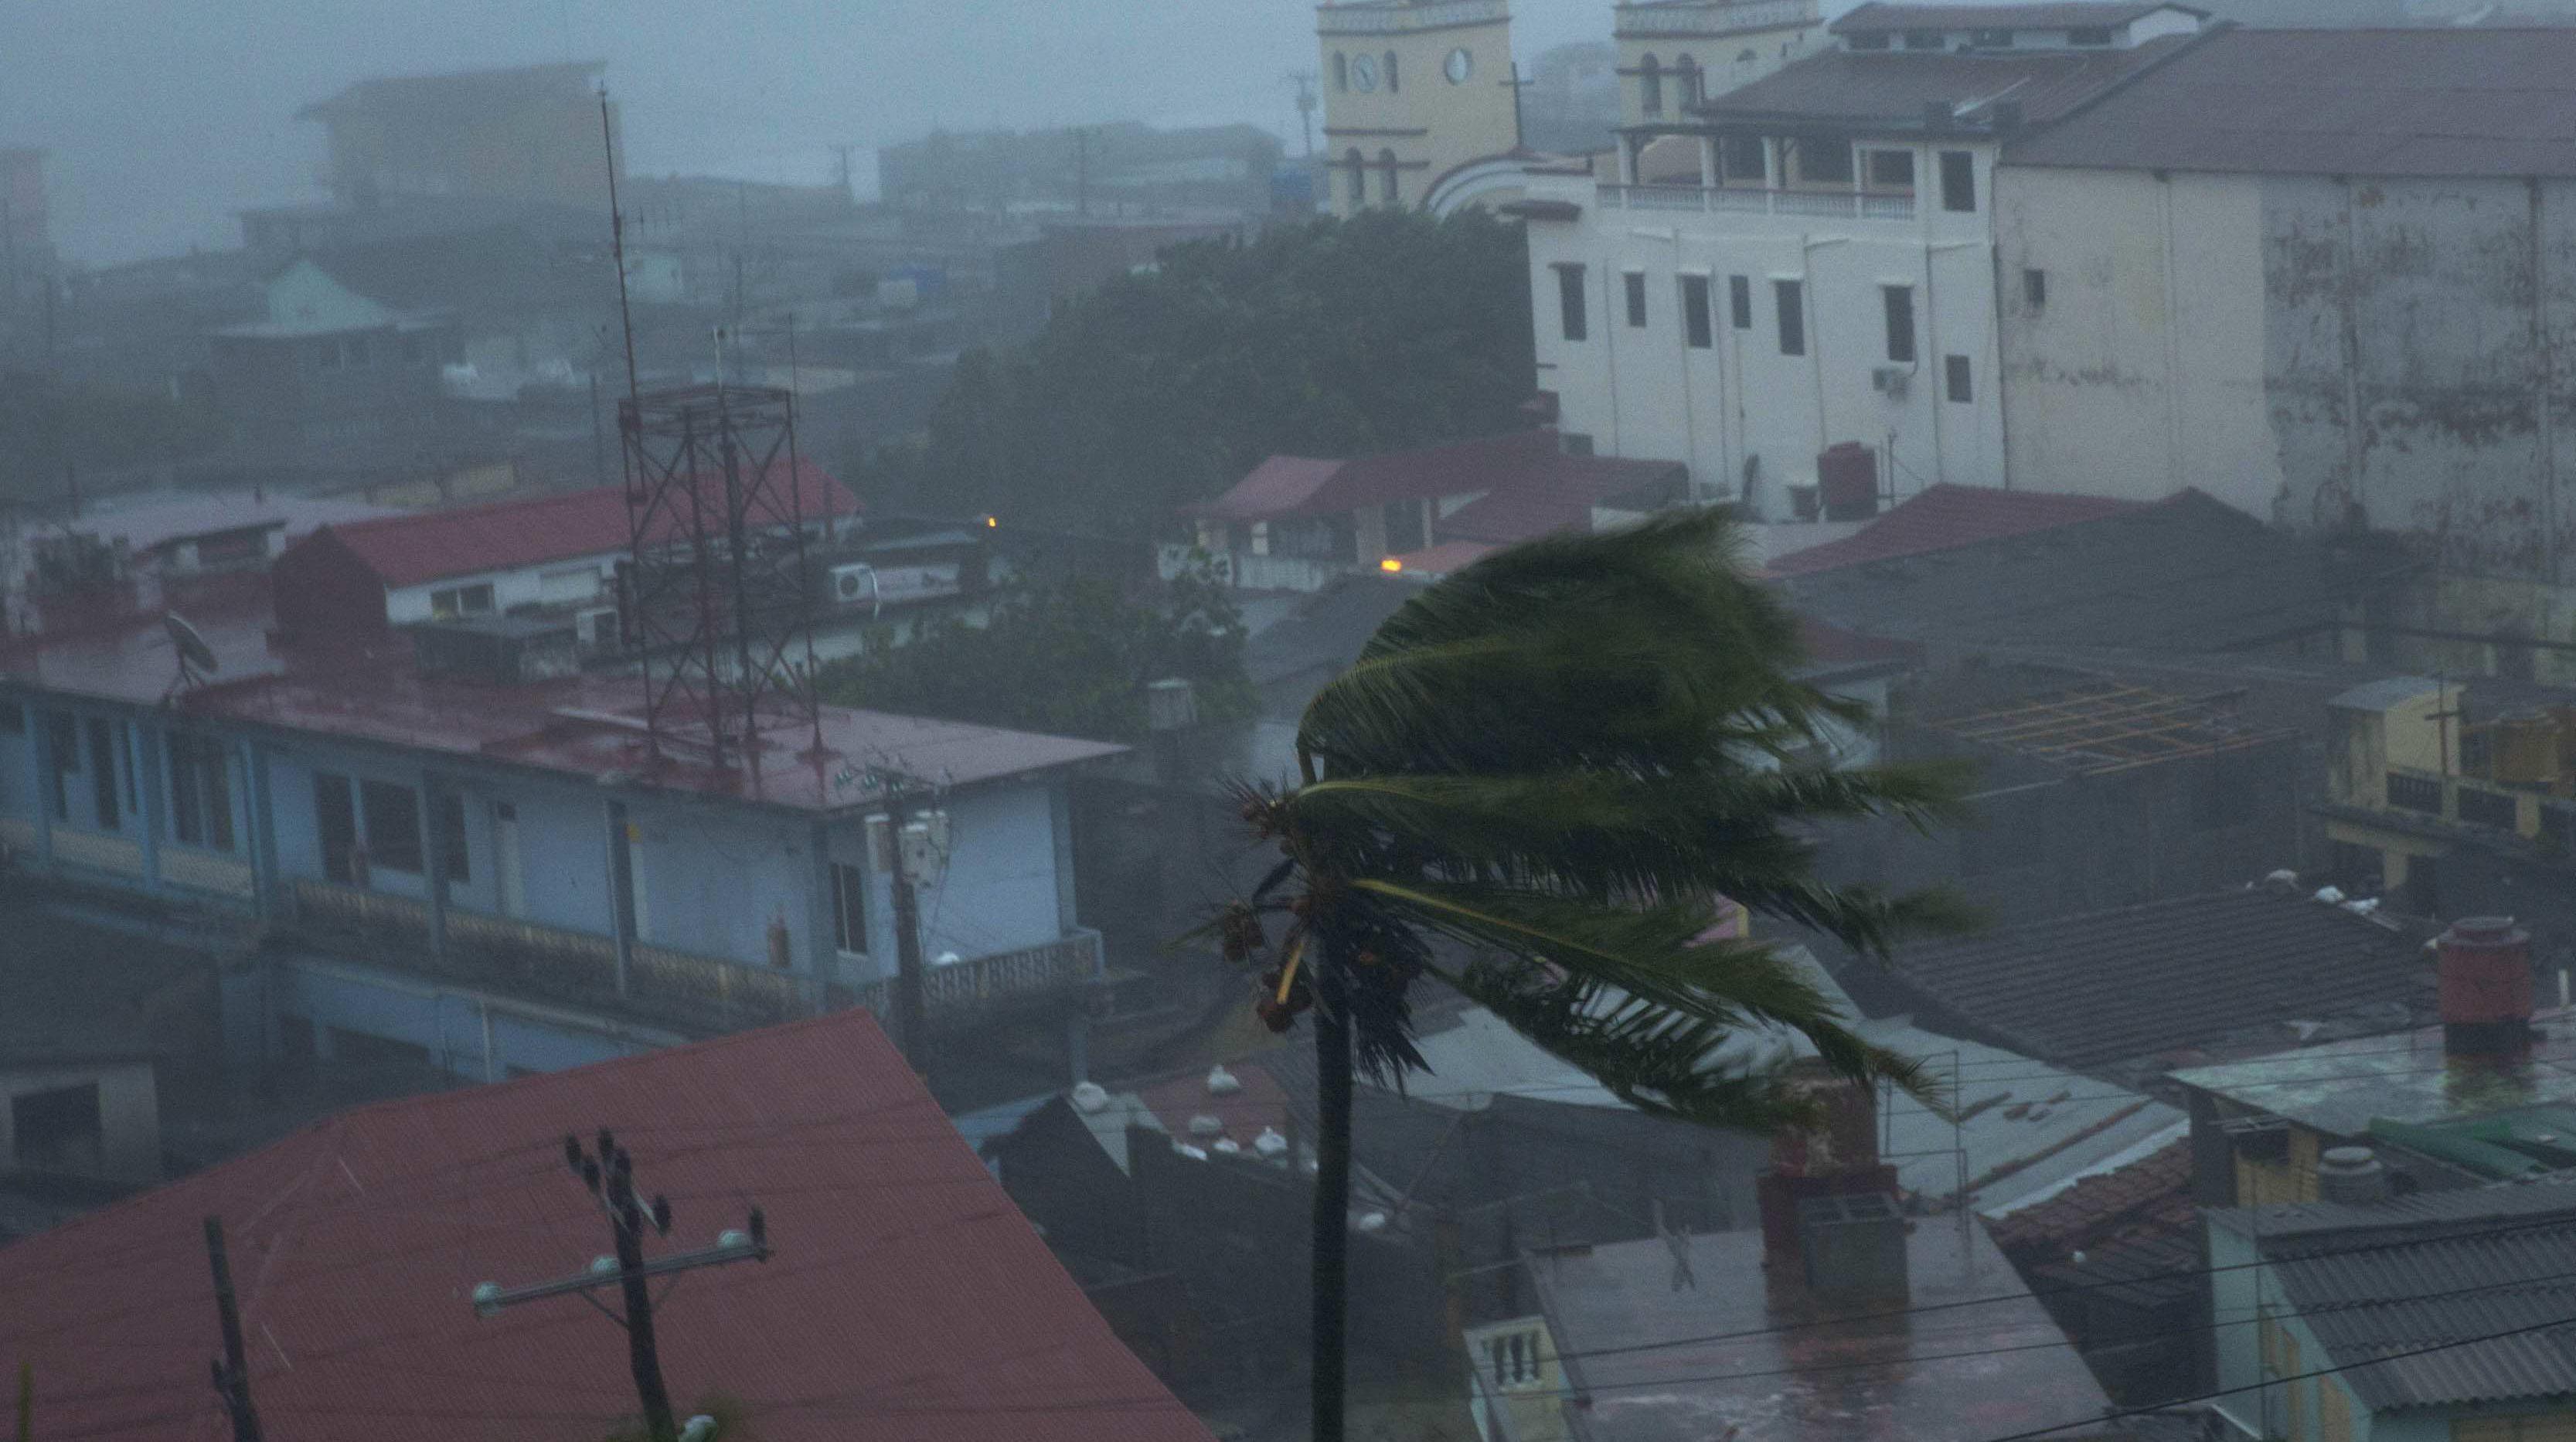 The high winds of Hurricane Matthew roar over Baracoa, Cuba on Oct. 4